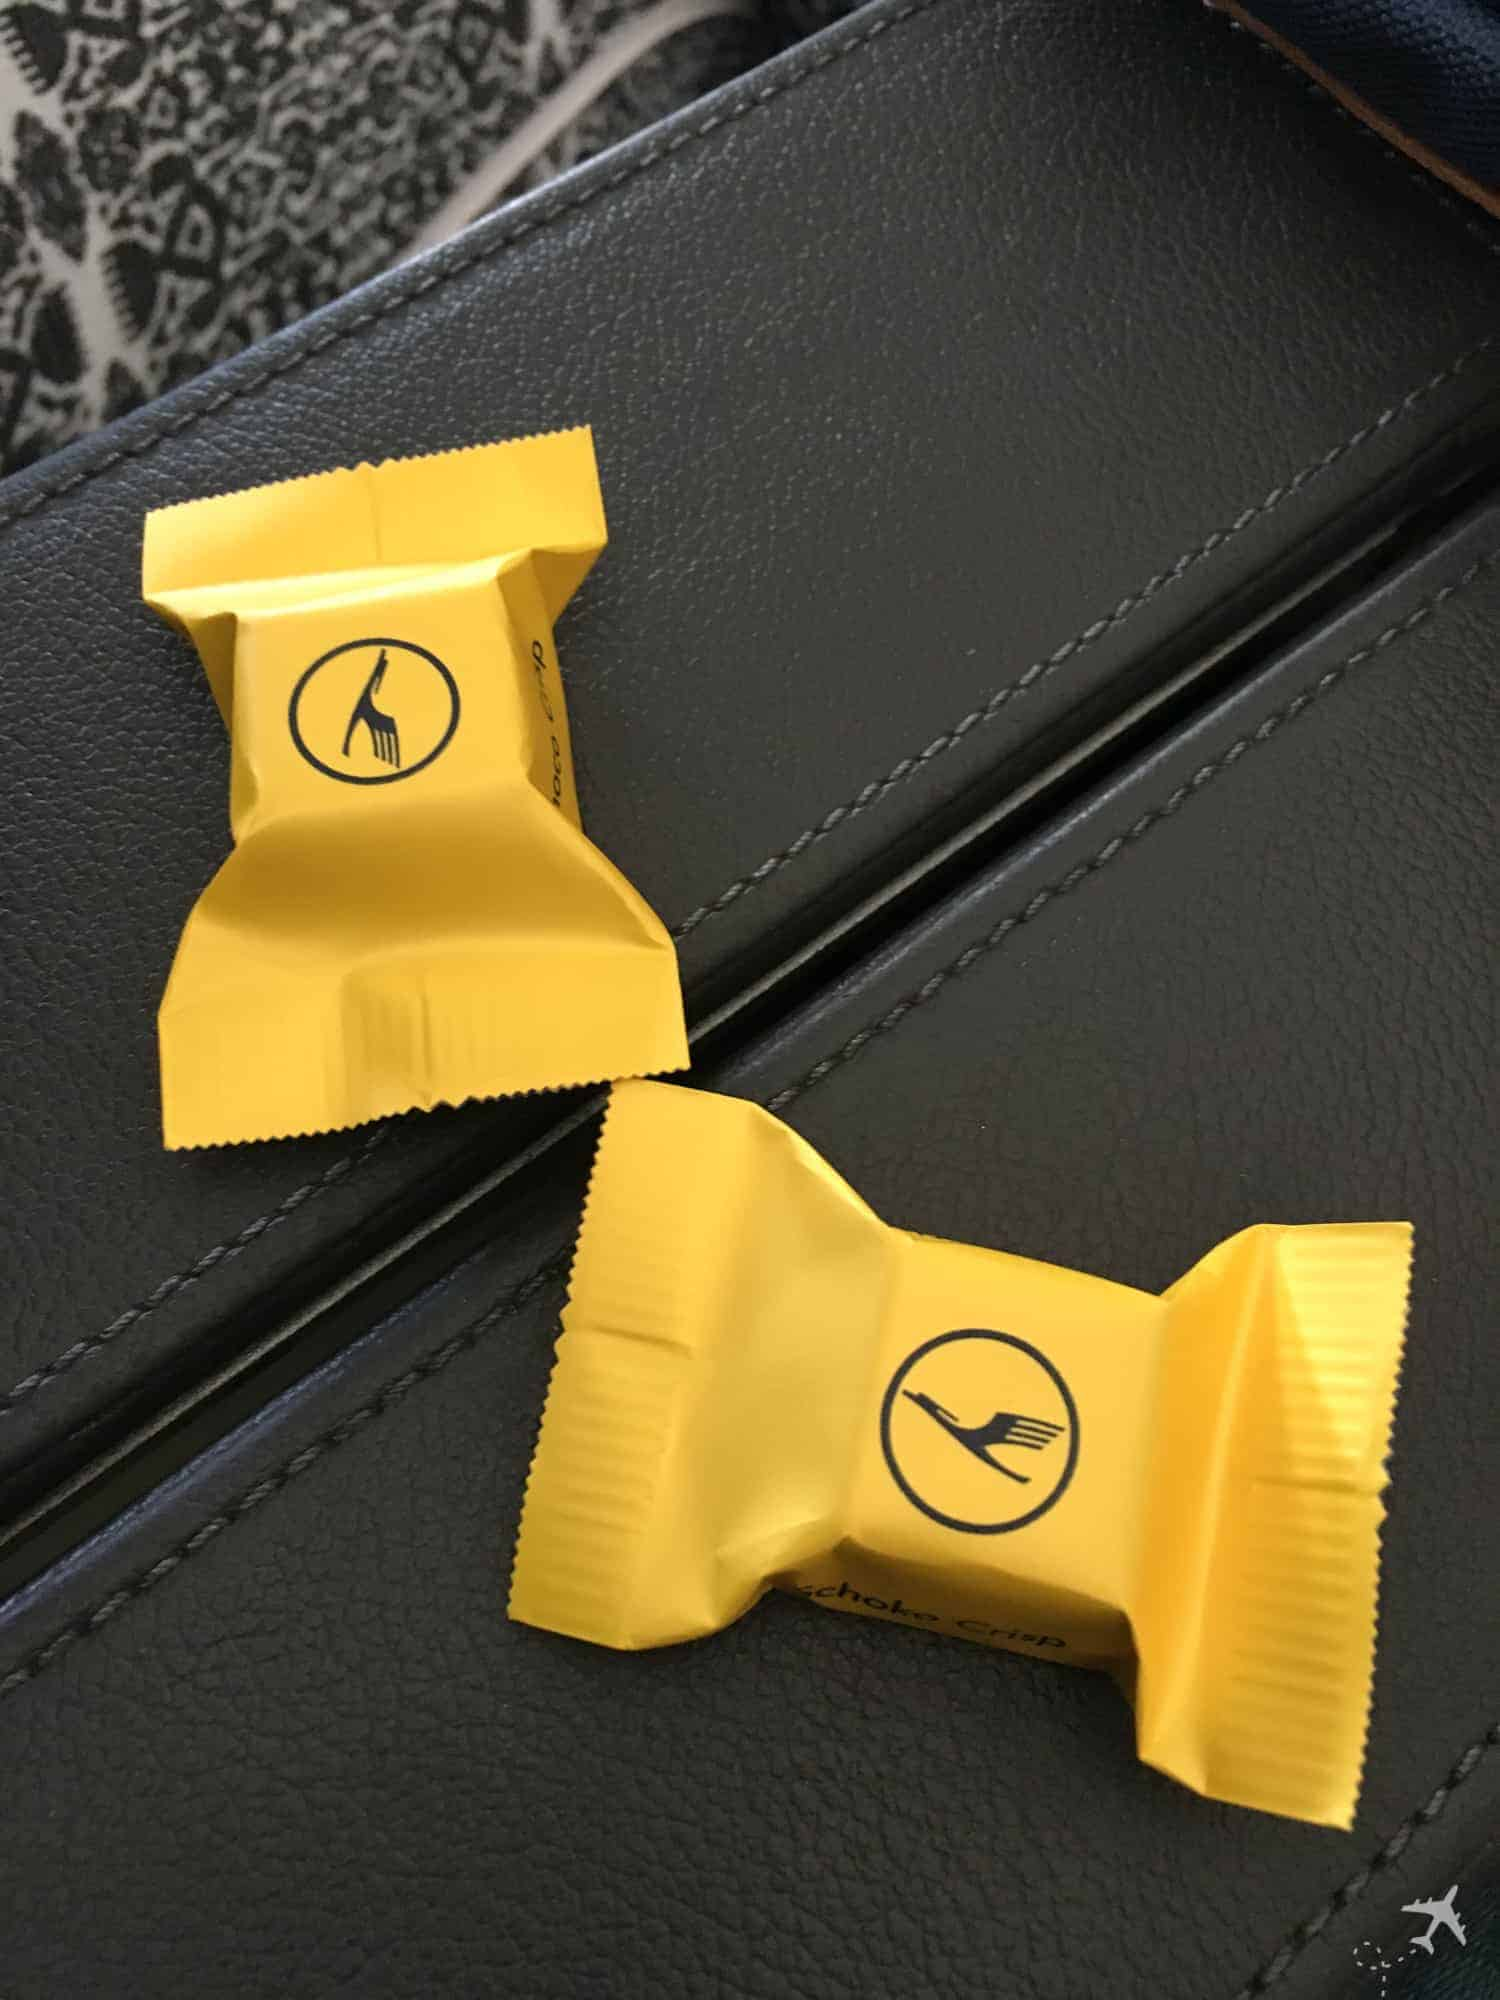 Lufthansa Premium Economy Class Schokolade